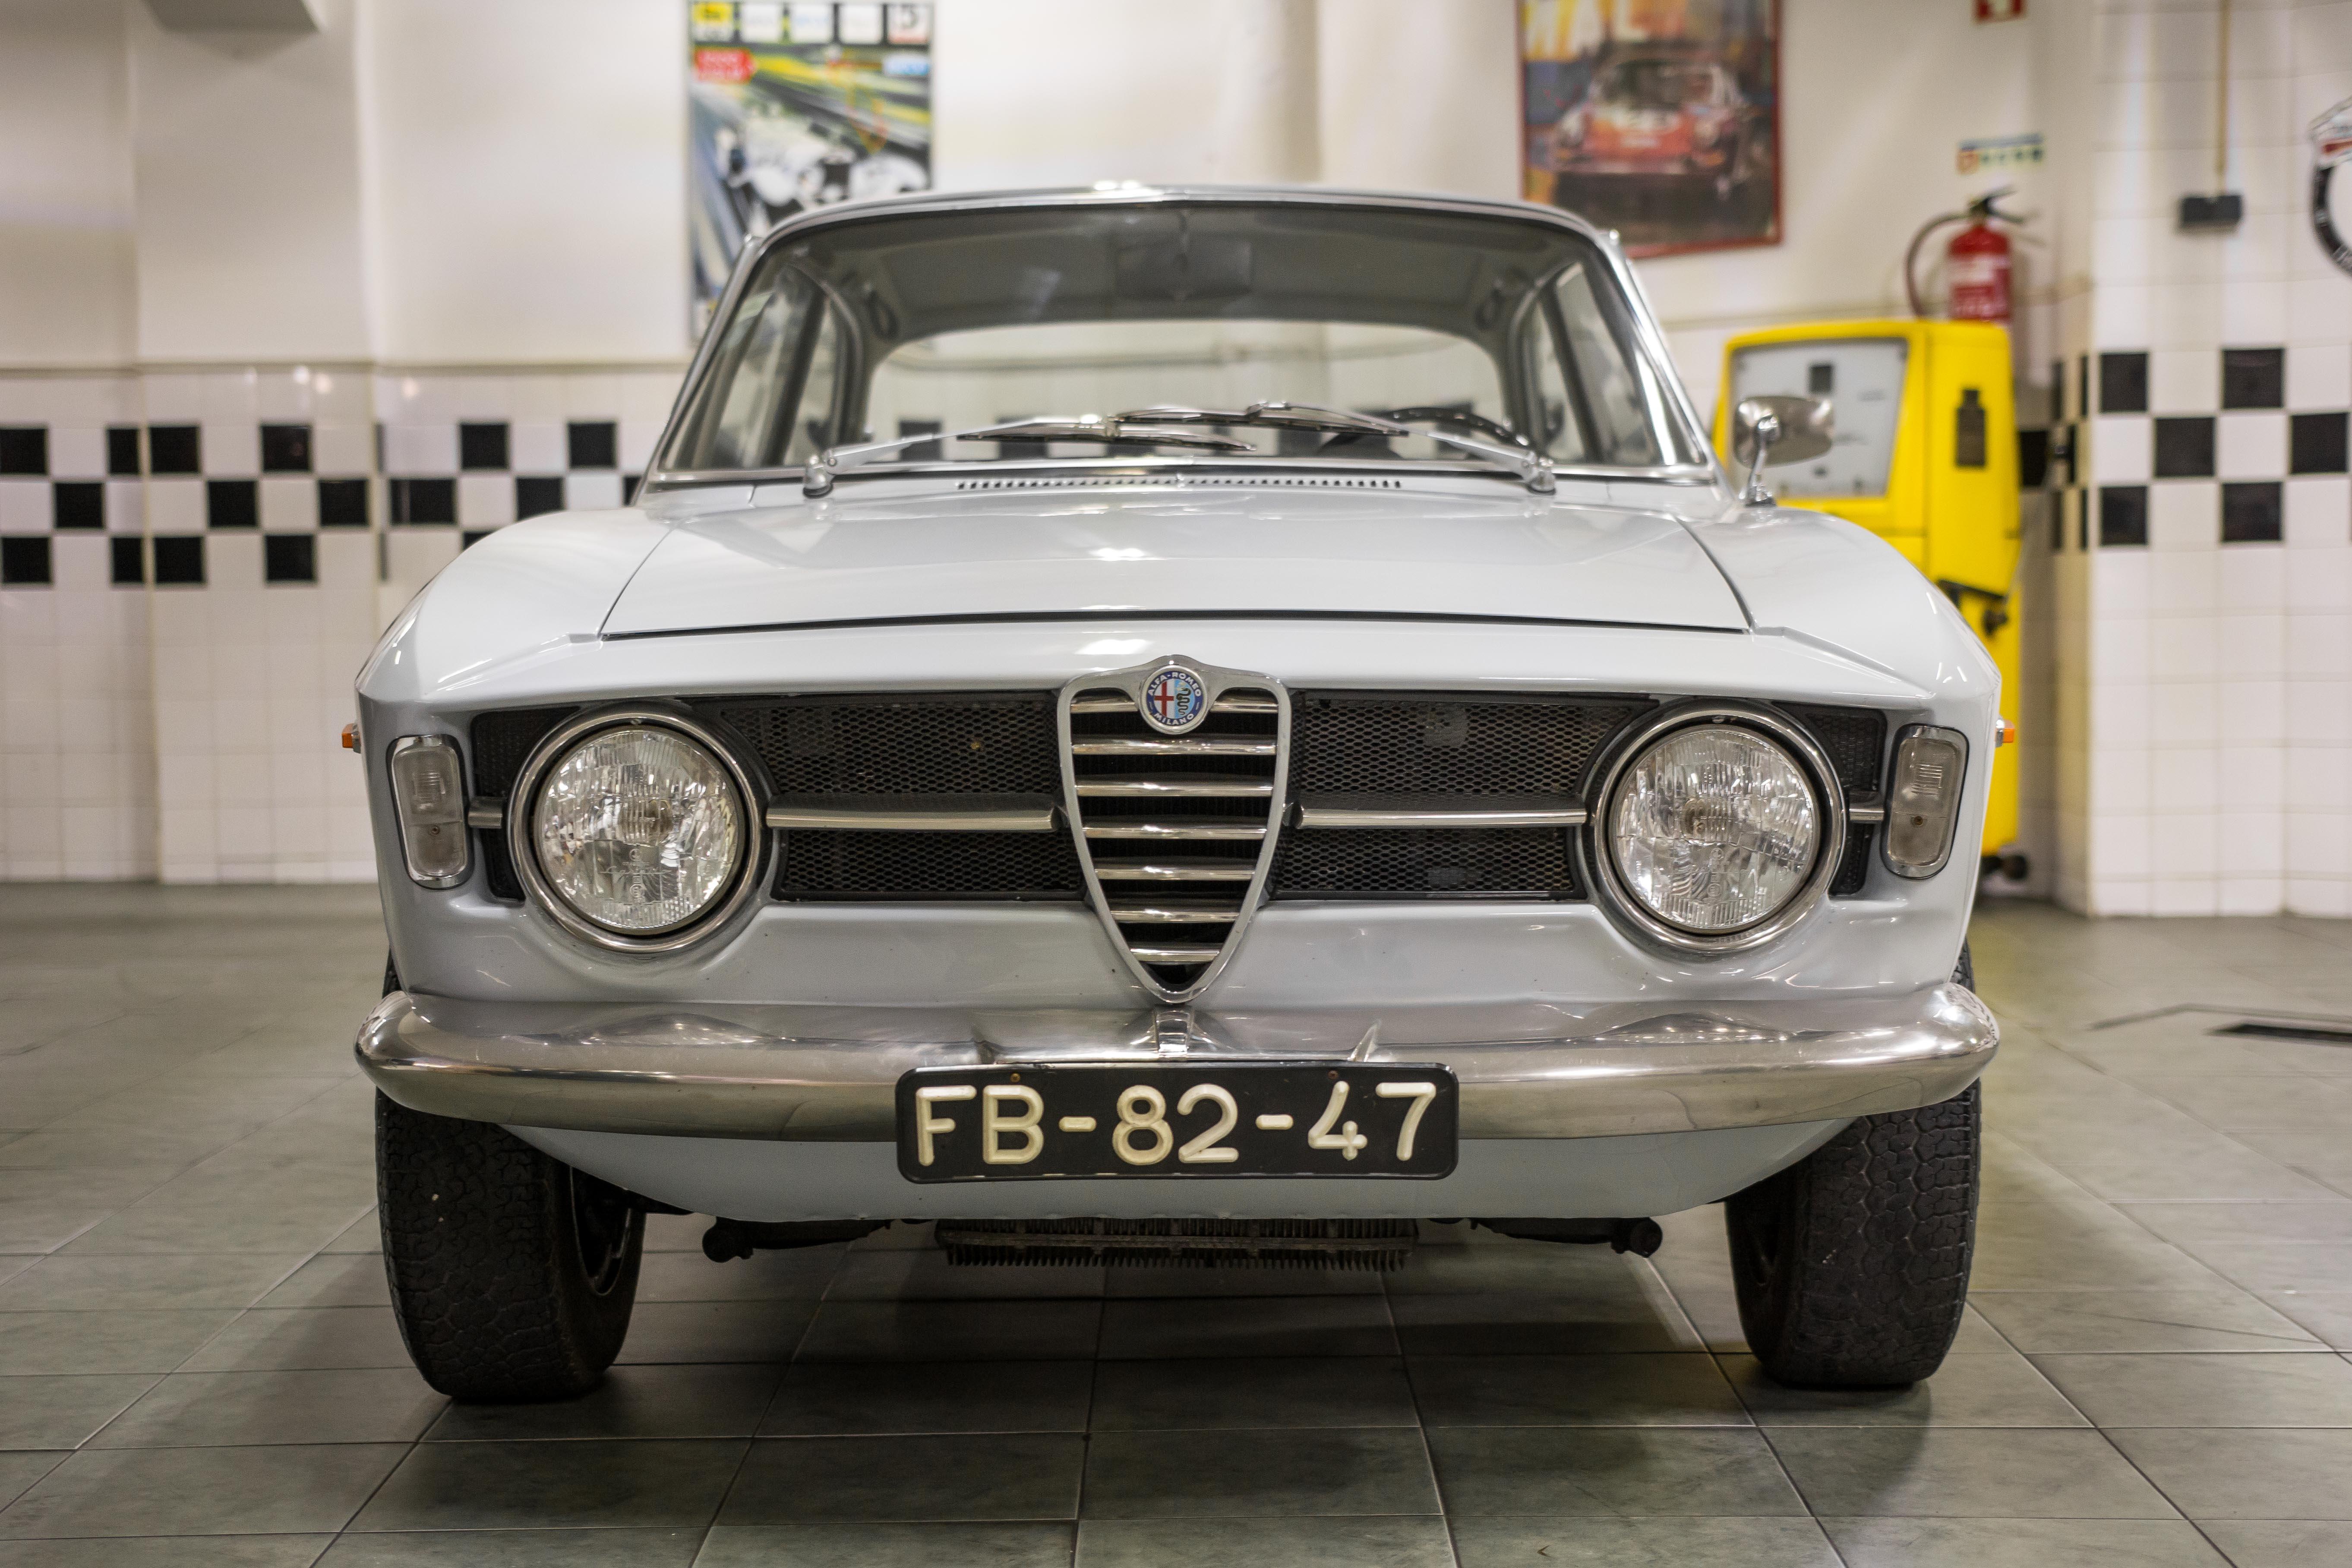 1970 Alfa Romeo Gt Junior Vintage Car For Sale 1300 Restoration Windscreen Wiper Motor